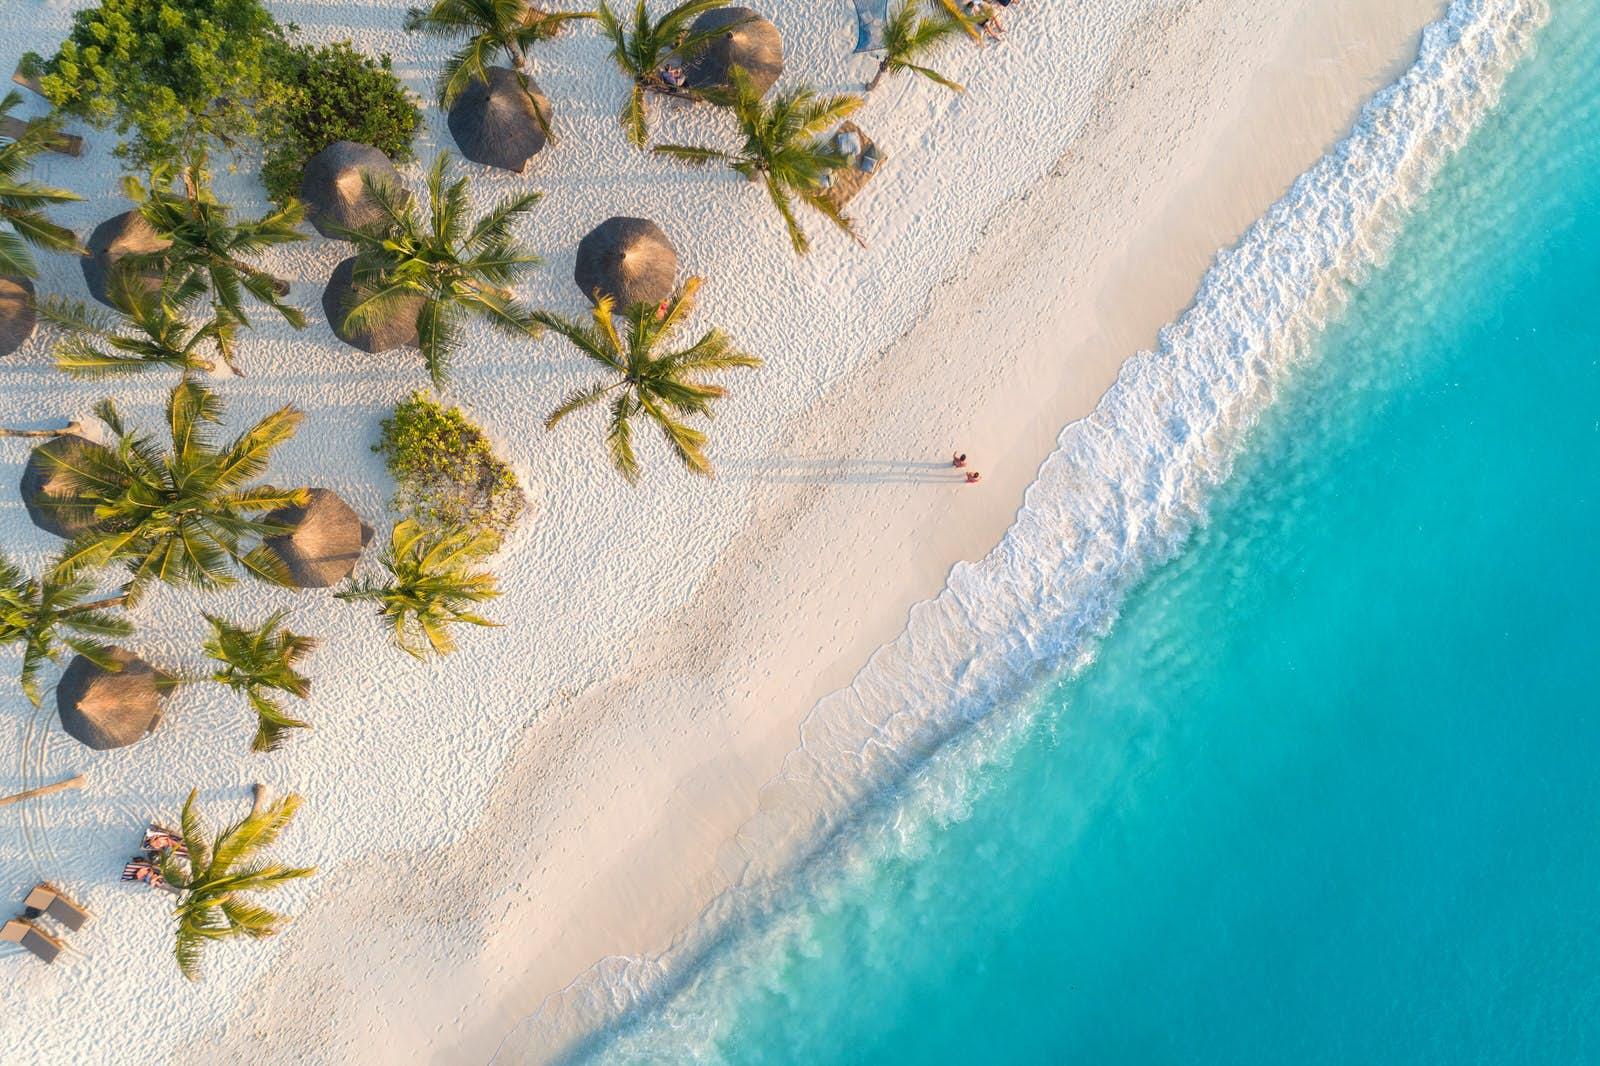 zanzibar-beaches-GettyImages-1136453253-0aac4dd3f8e1